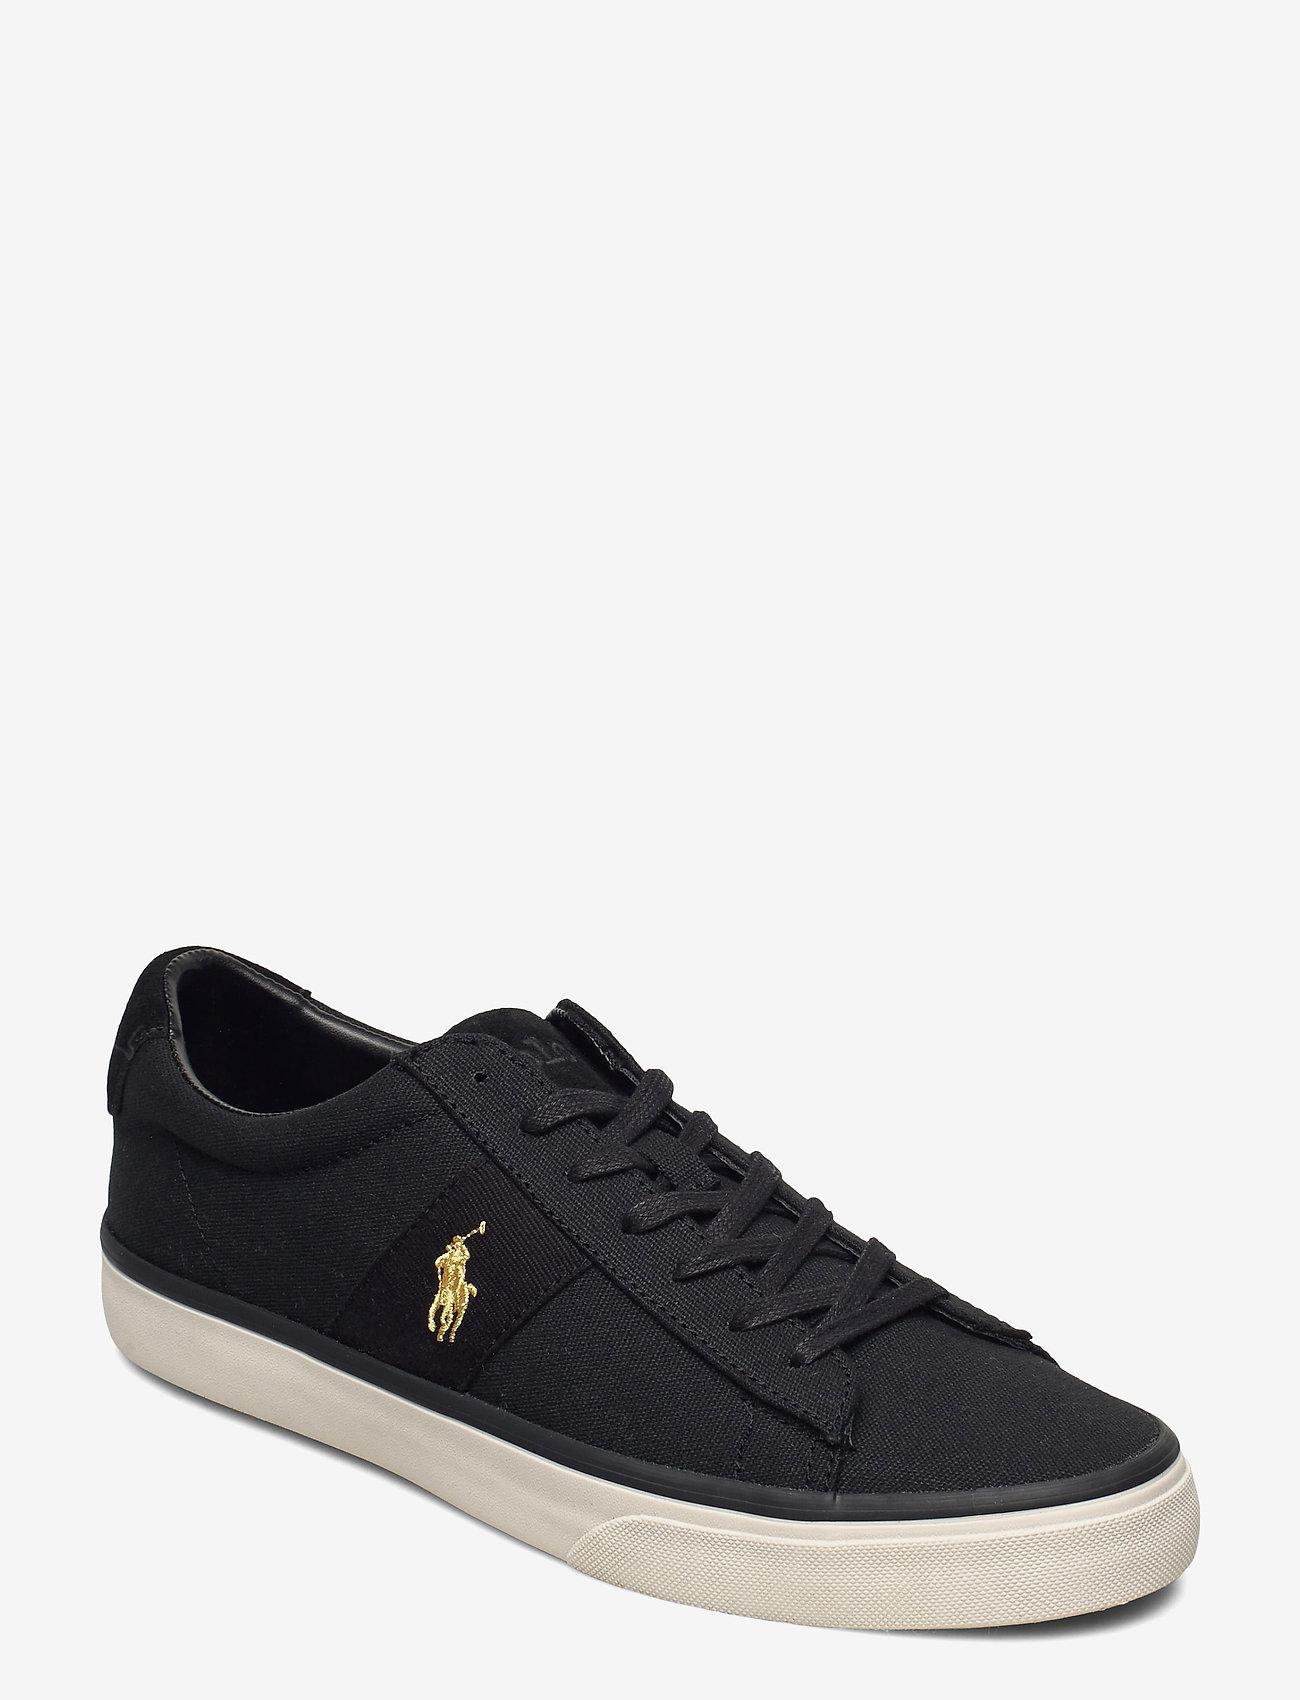 Sayer Canvas Sneaker (Black/gold Pp